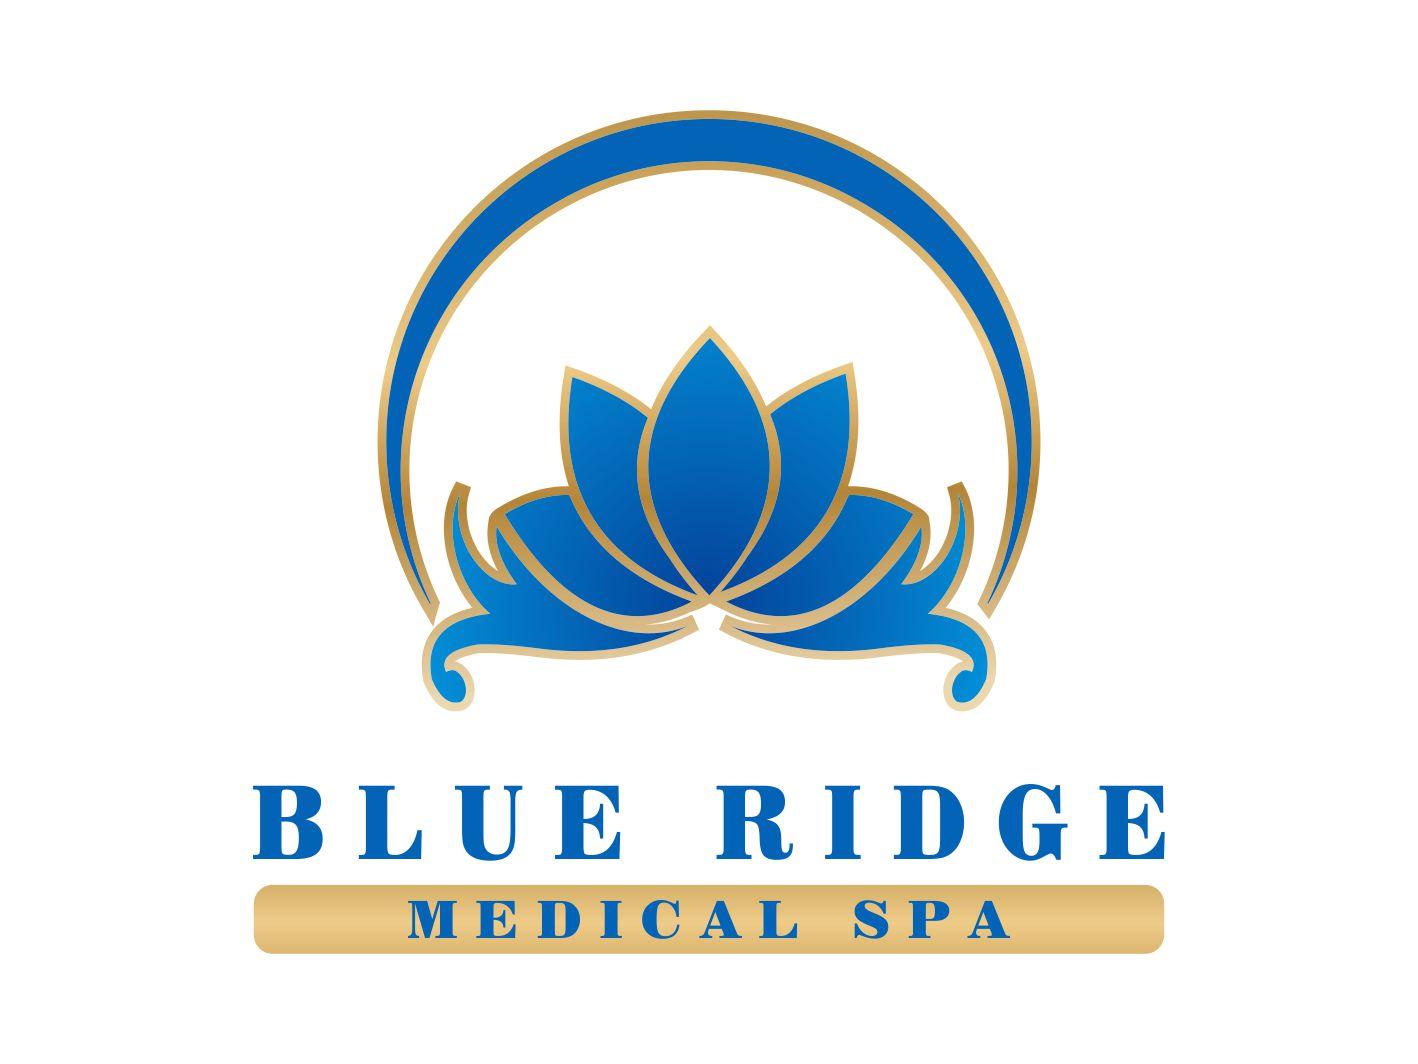 Blue Ridge Medical Spa